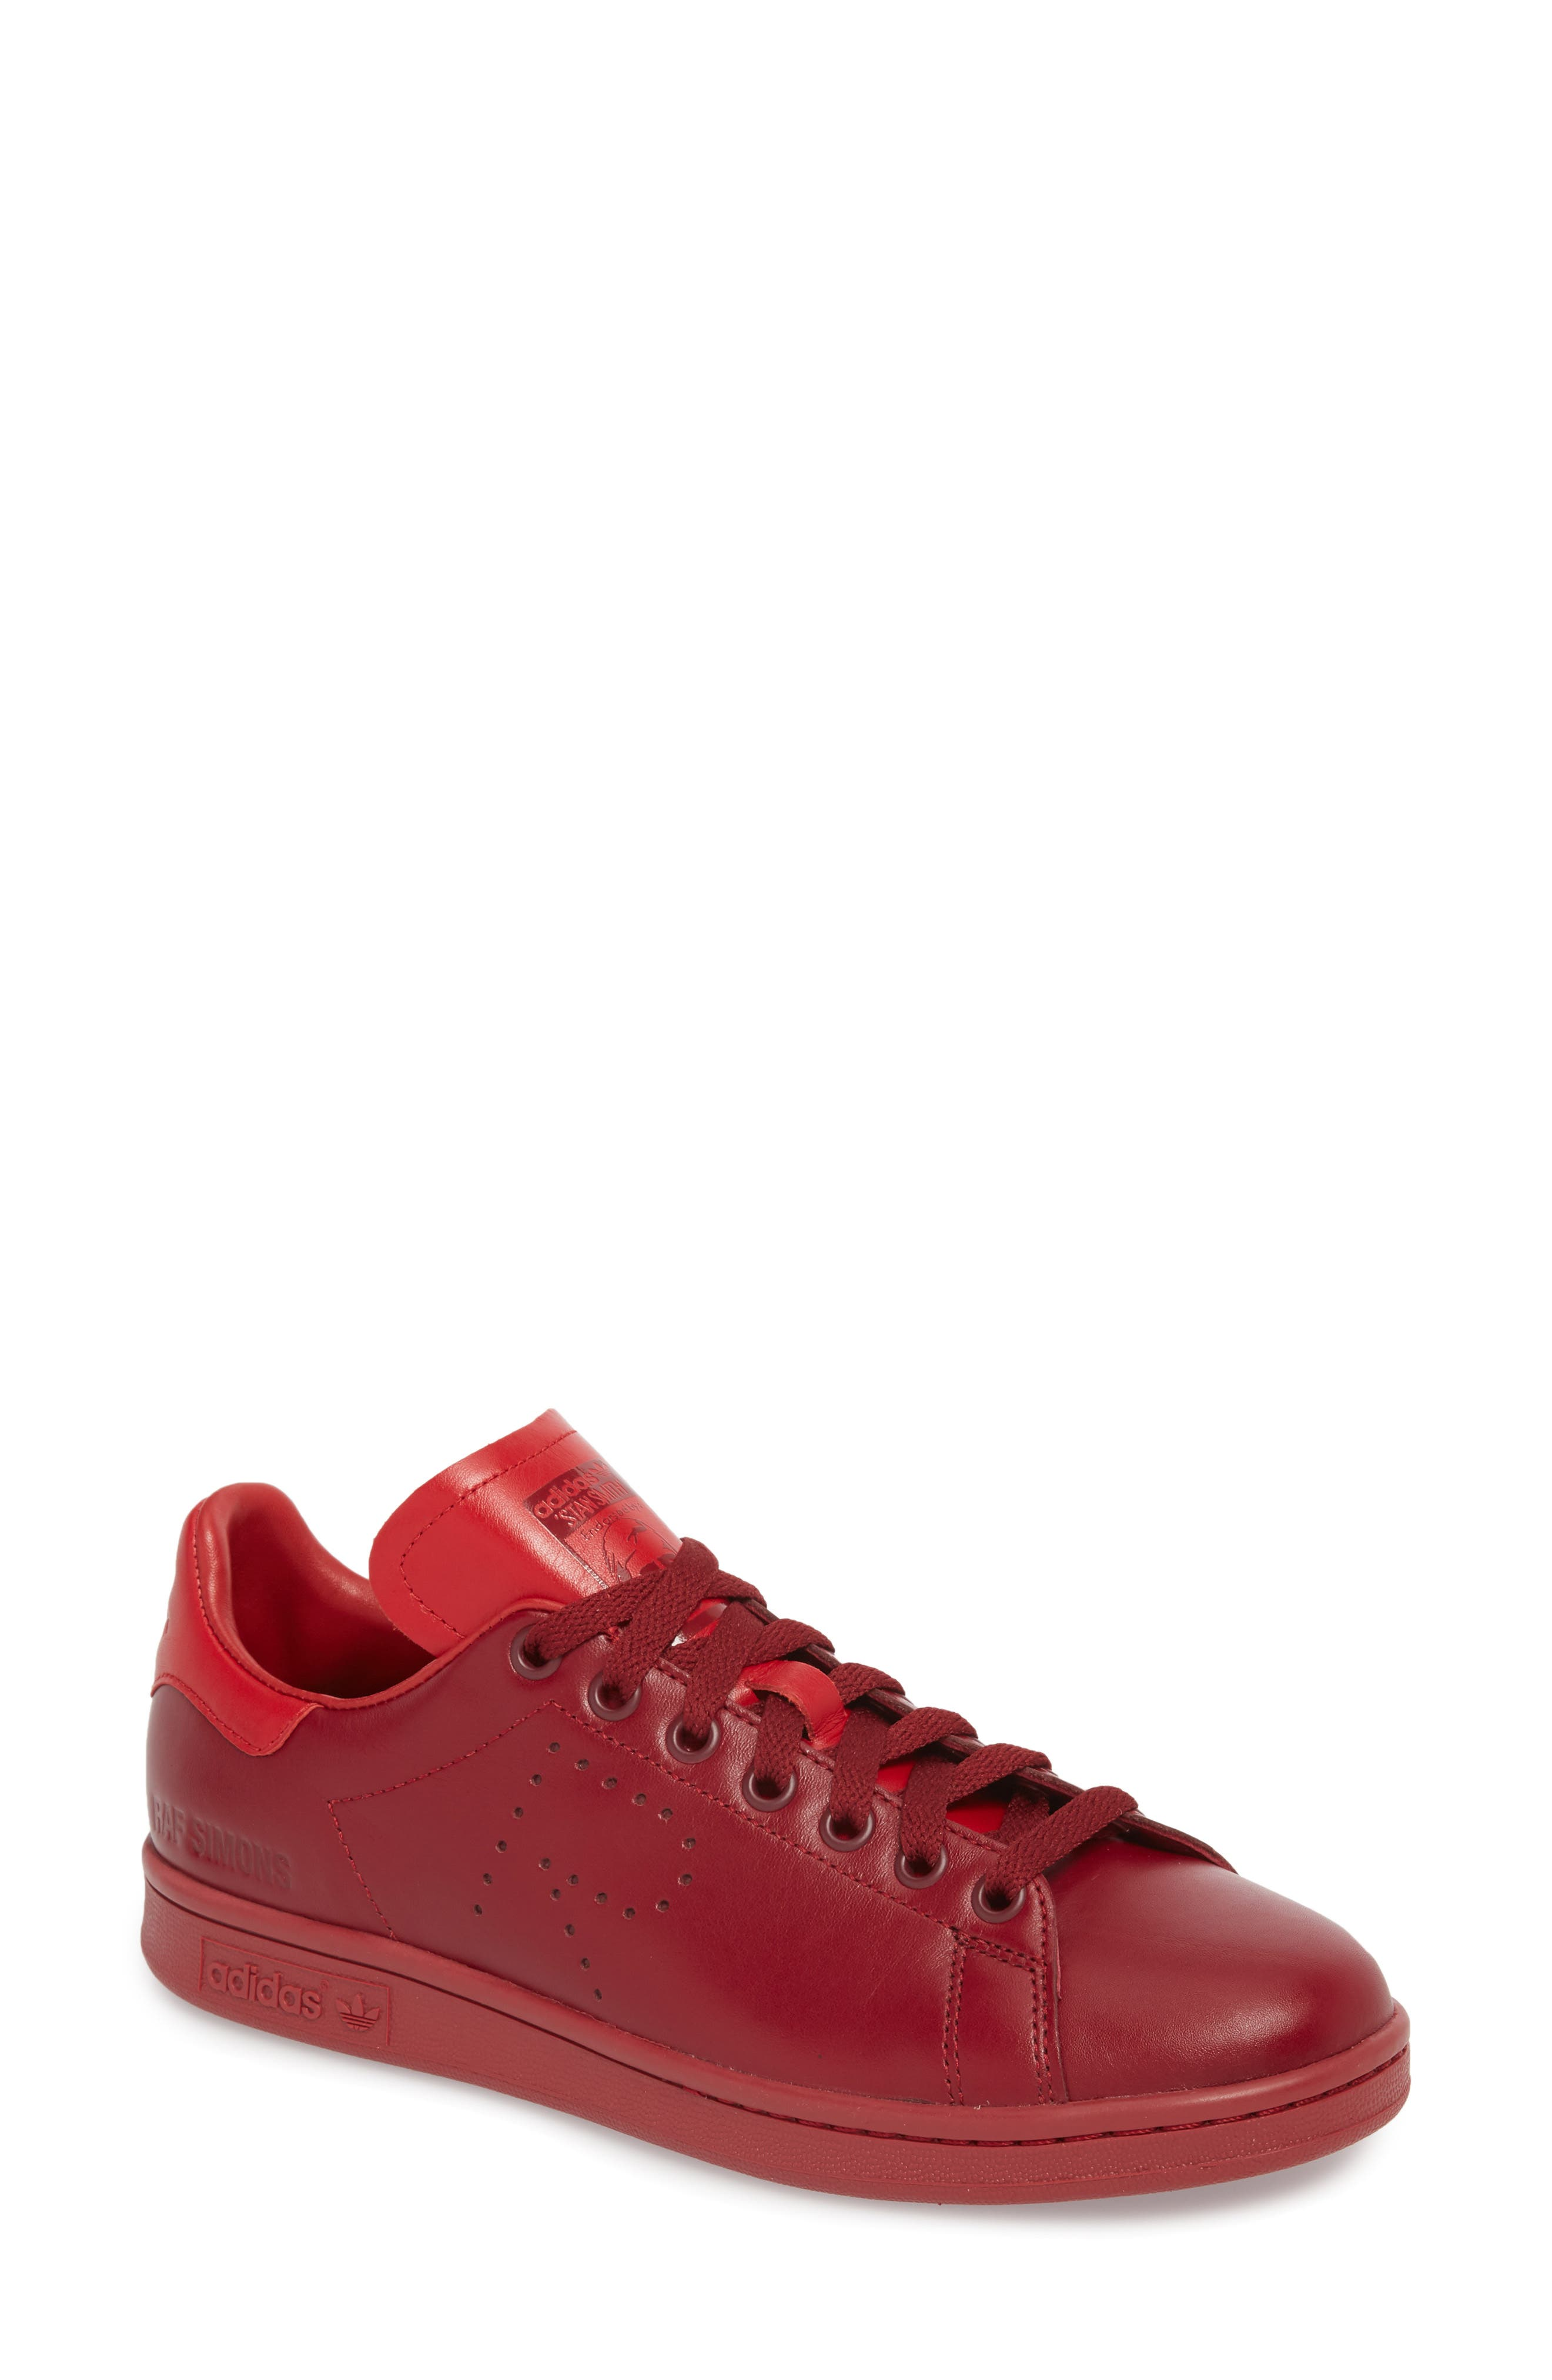 Stan Smith Sneaker,                             Main thumbnail 1, color,                             Burgundy/ Power Red/ Burgundy